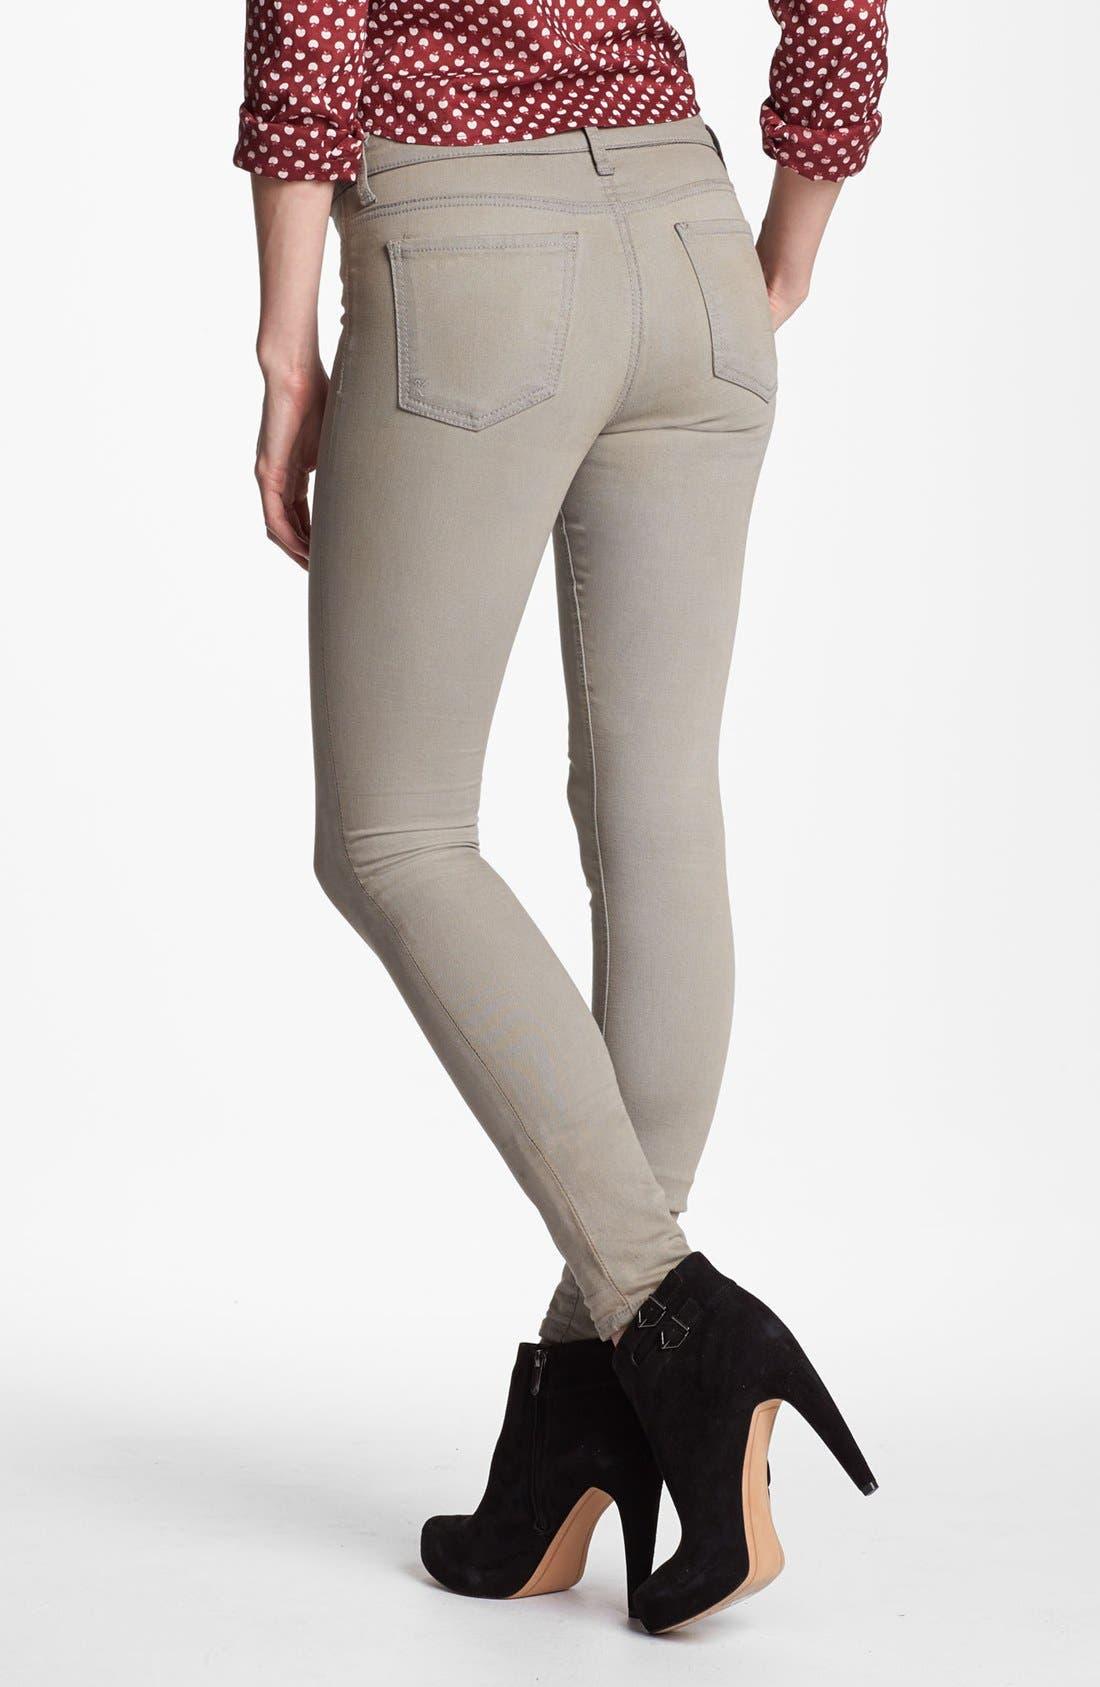 Alternate Image 3  - KUT from the Kloth 'Jennifer' Skinny Jeans (Taupe Grey)